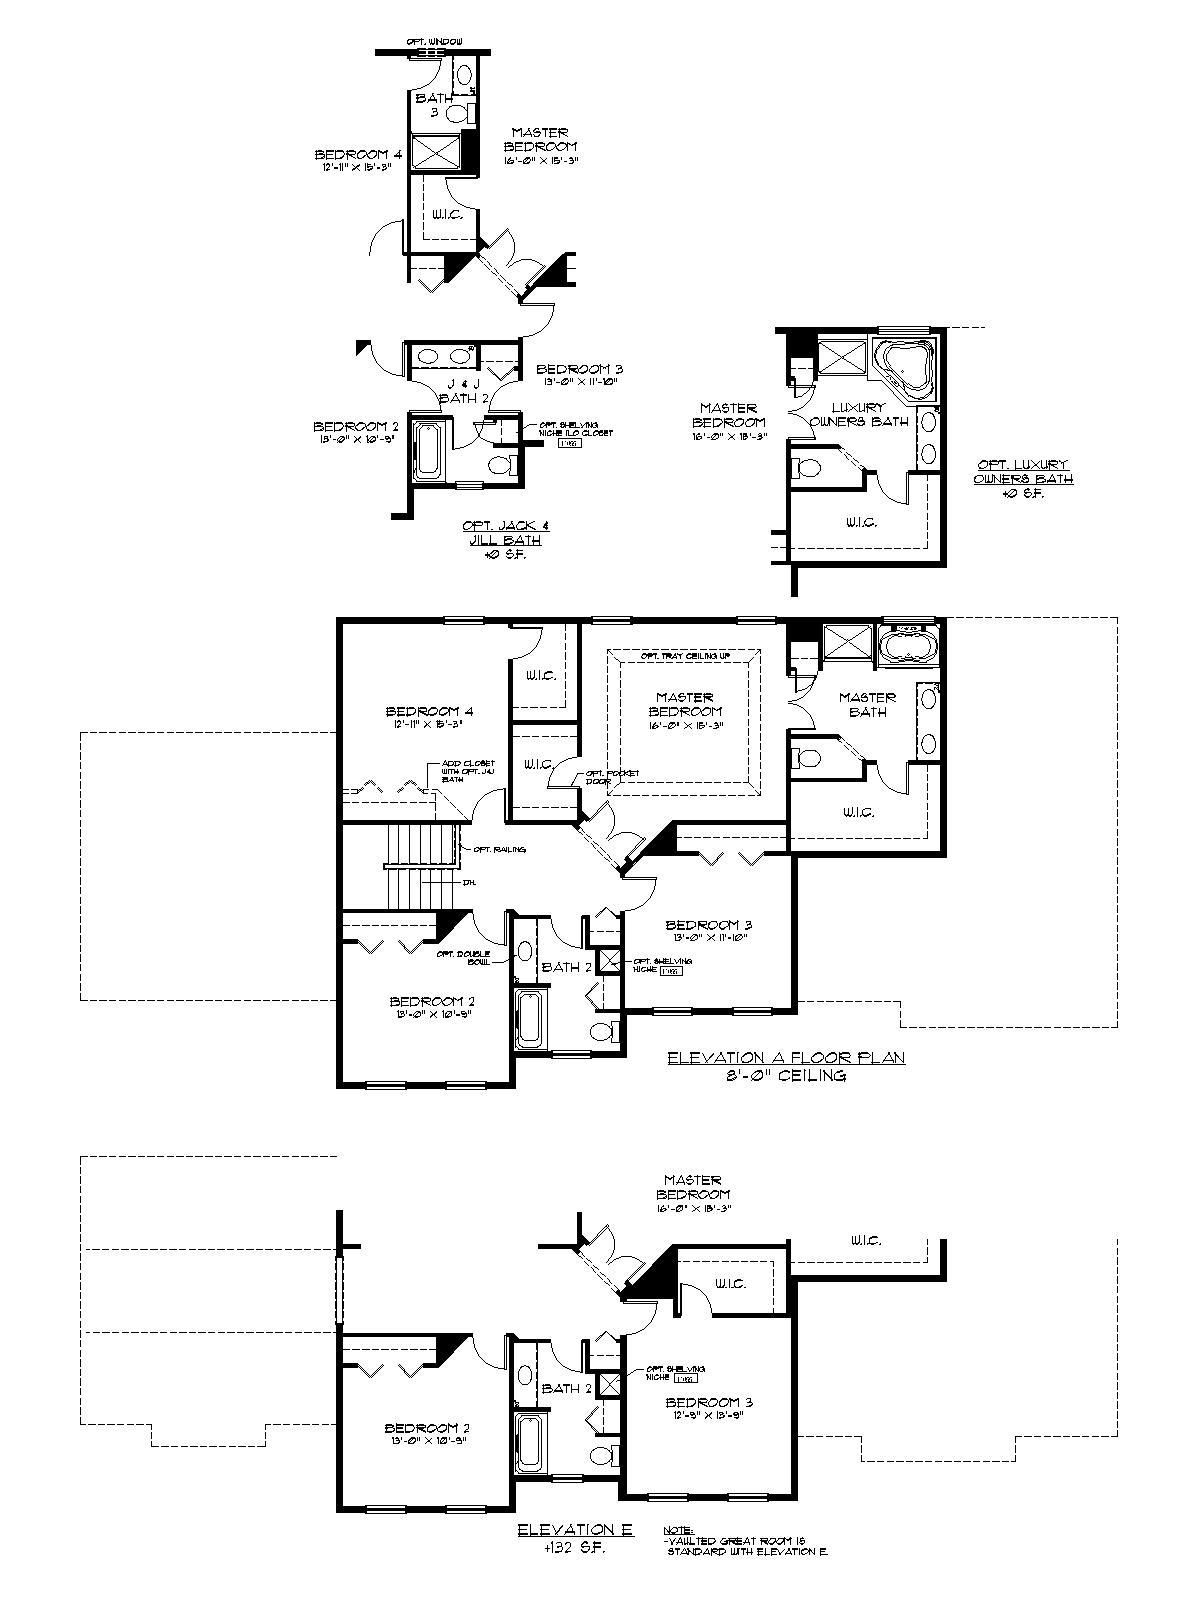 The Ariel floor plan, second floor | Floor Plans | Custom home ... on christmas story house floor plan, frodo baggins house floor plan, gatsby house floor plan, incredibles house floor plan, barbie house floor plan,